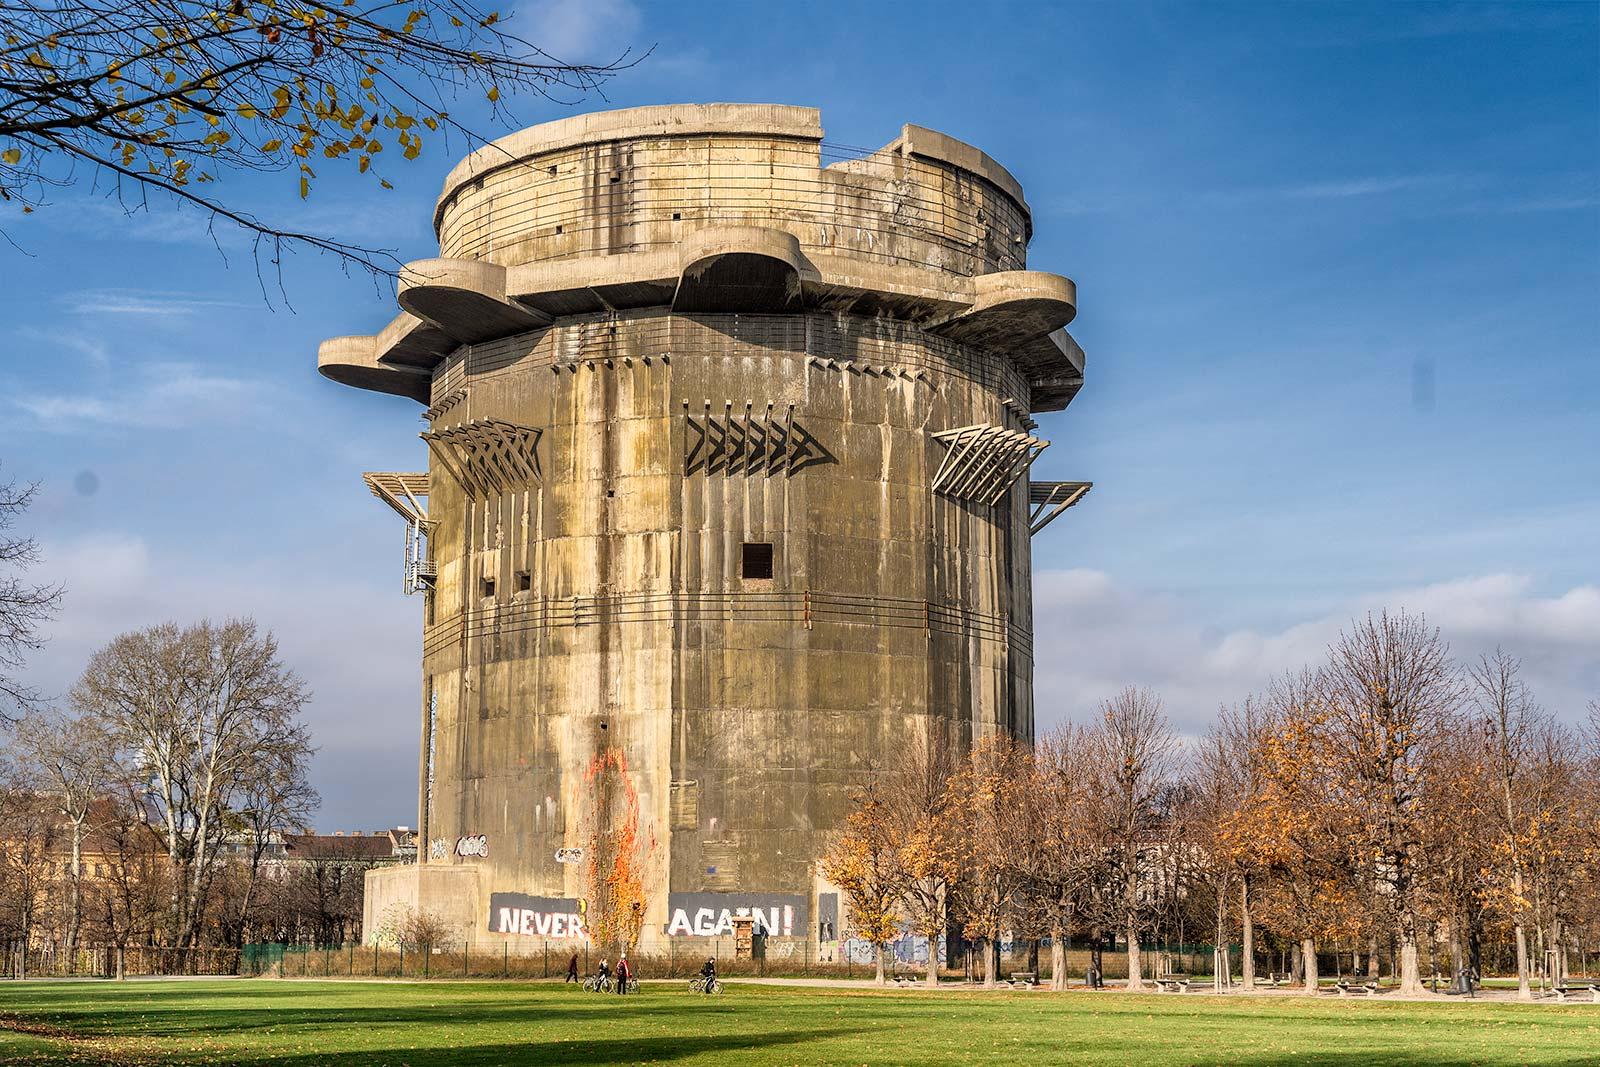 FlaK Tower G